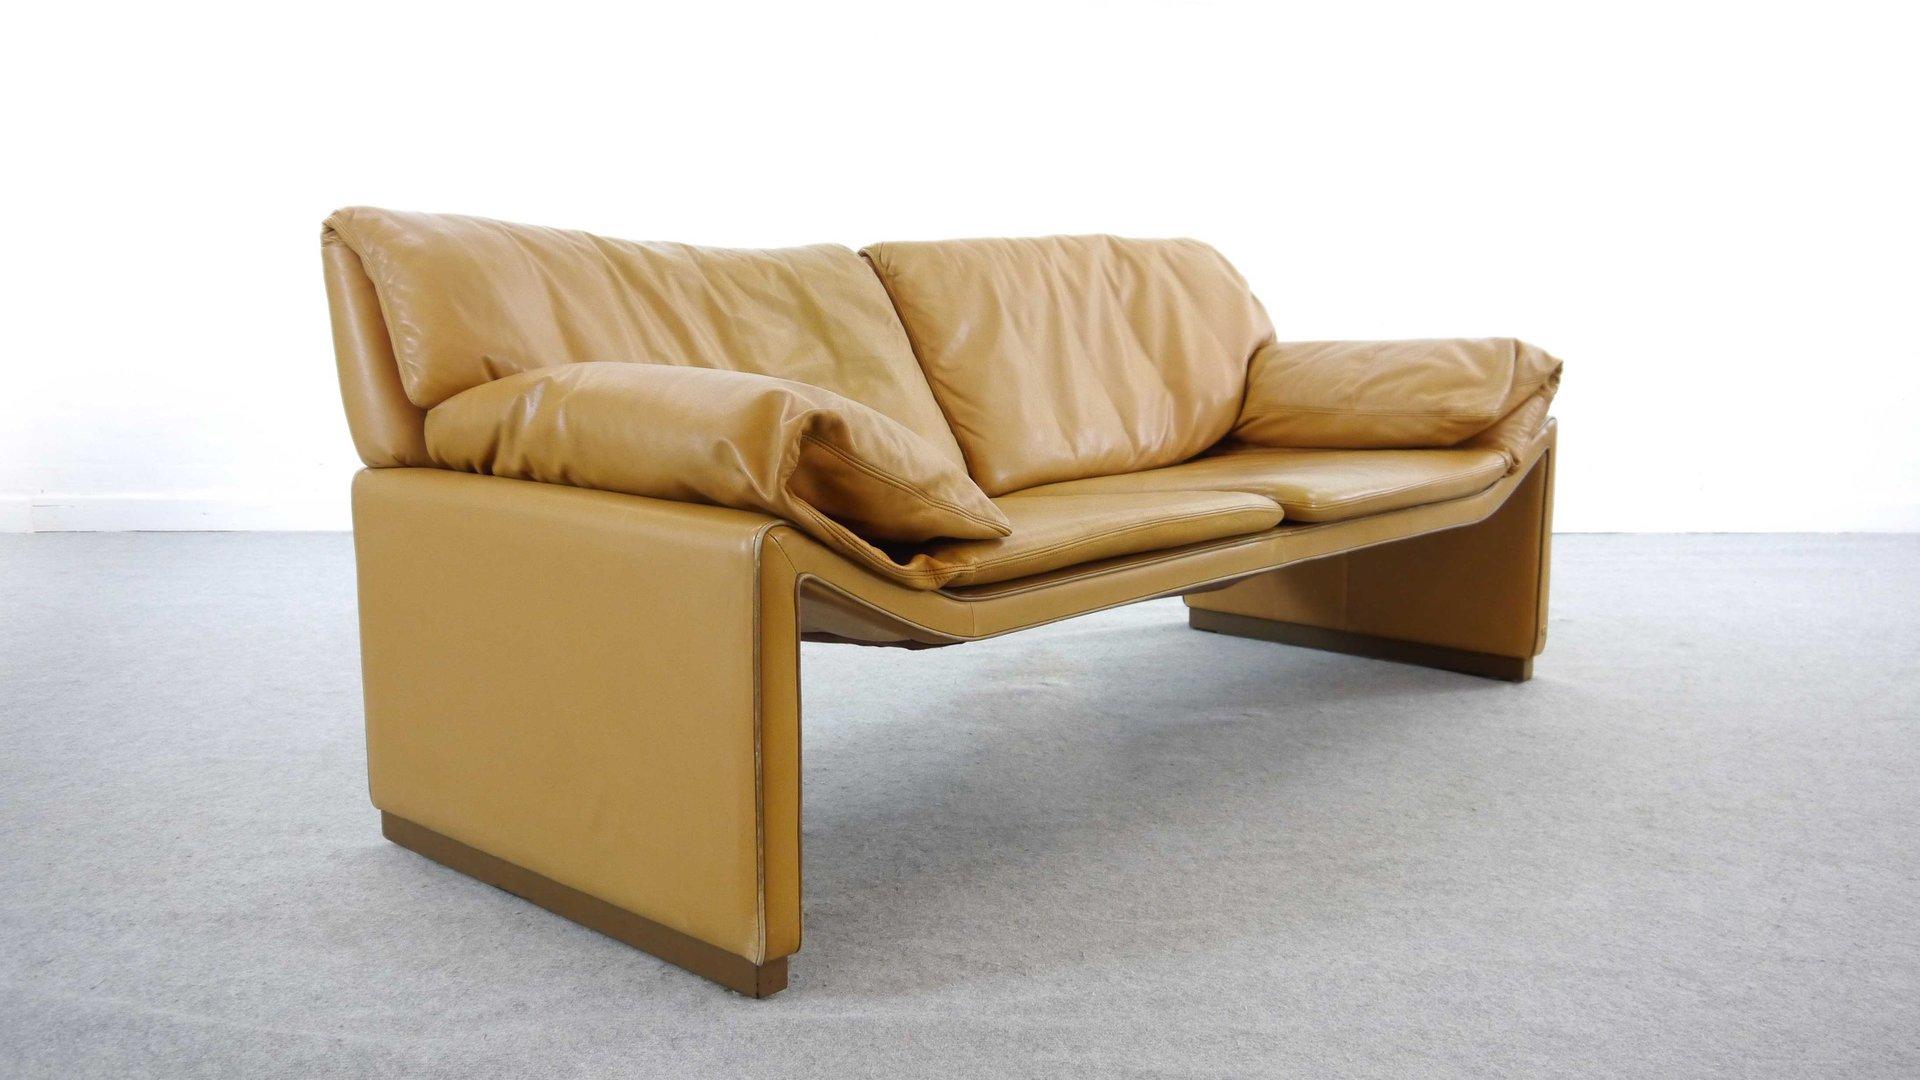 2 sitzer sofa aus cognac leder von etienne aigner 1980er. Black Bedroom Furniture Sets. Home Design Ideas